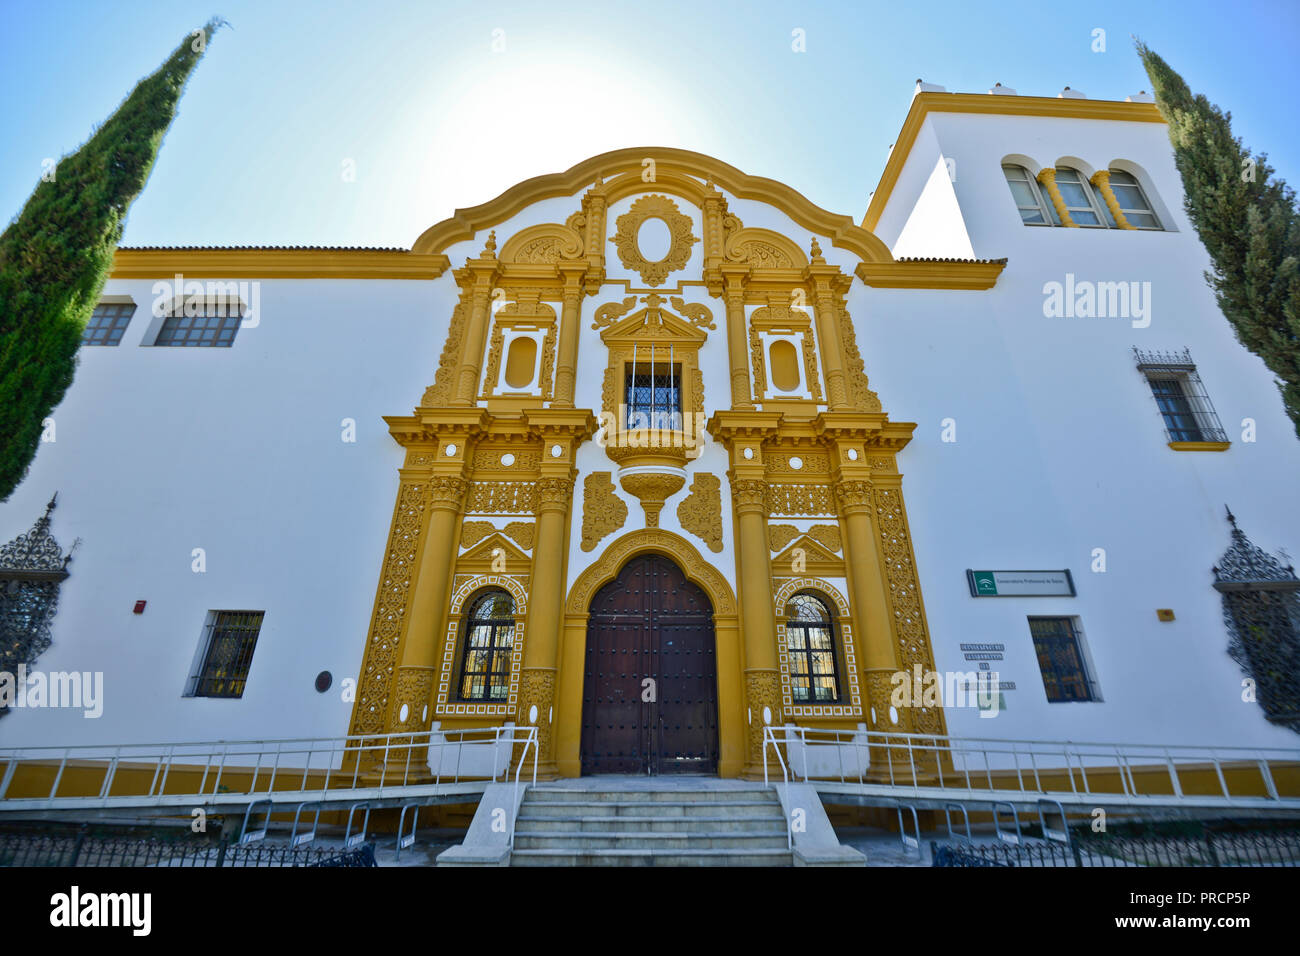 Conservatorio Profesional de Danza Antonio Ruiz Soler. Sevilla, España Imagen De Stock